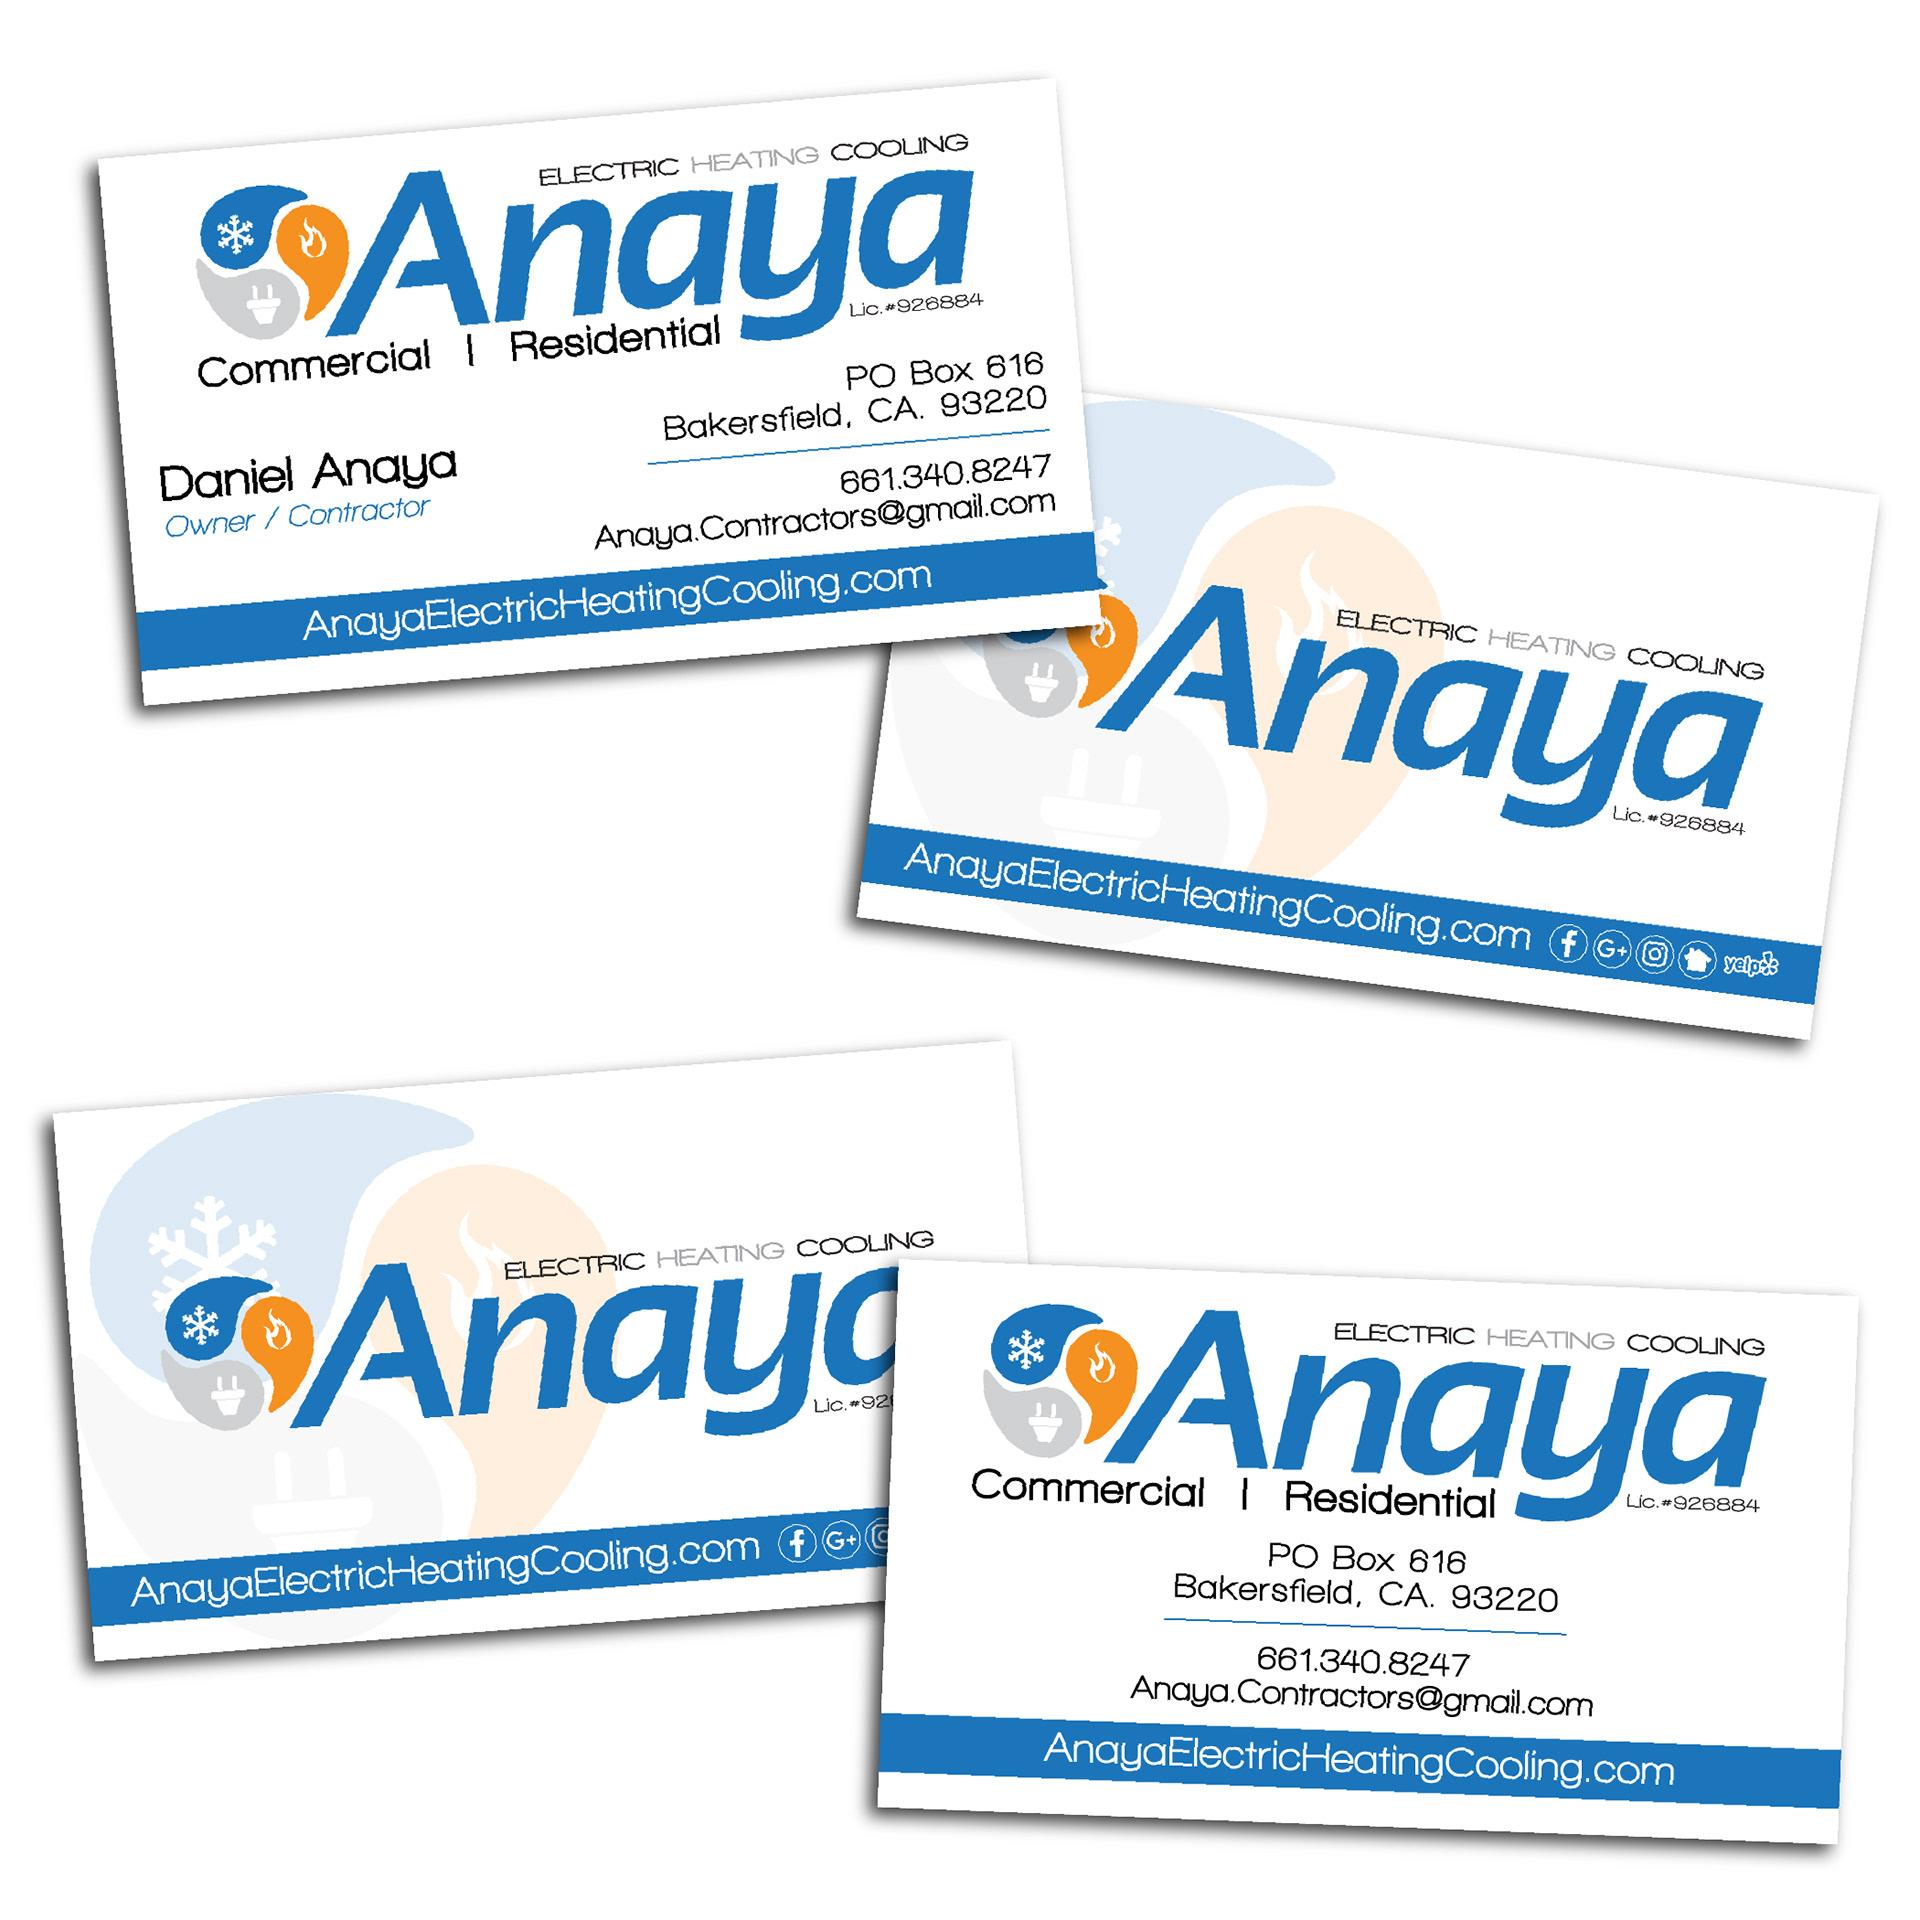 Ginomai creative design portfolio business cards business cards reheart Images